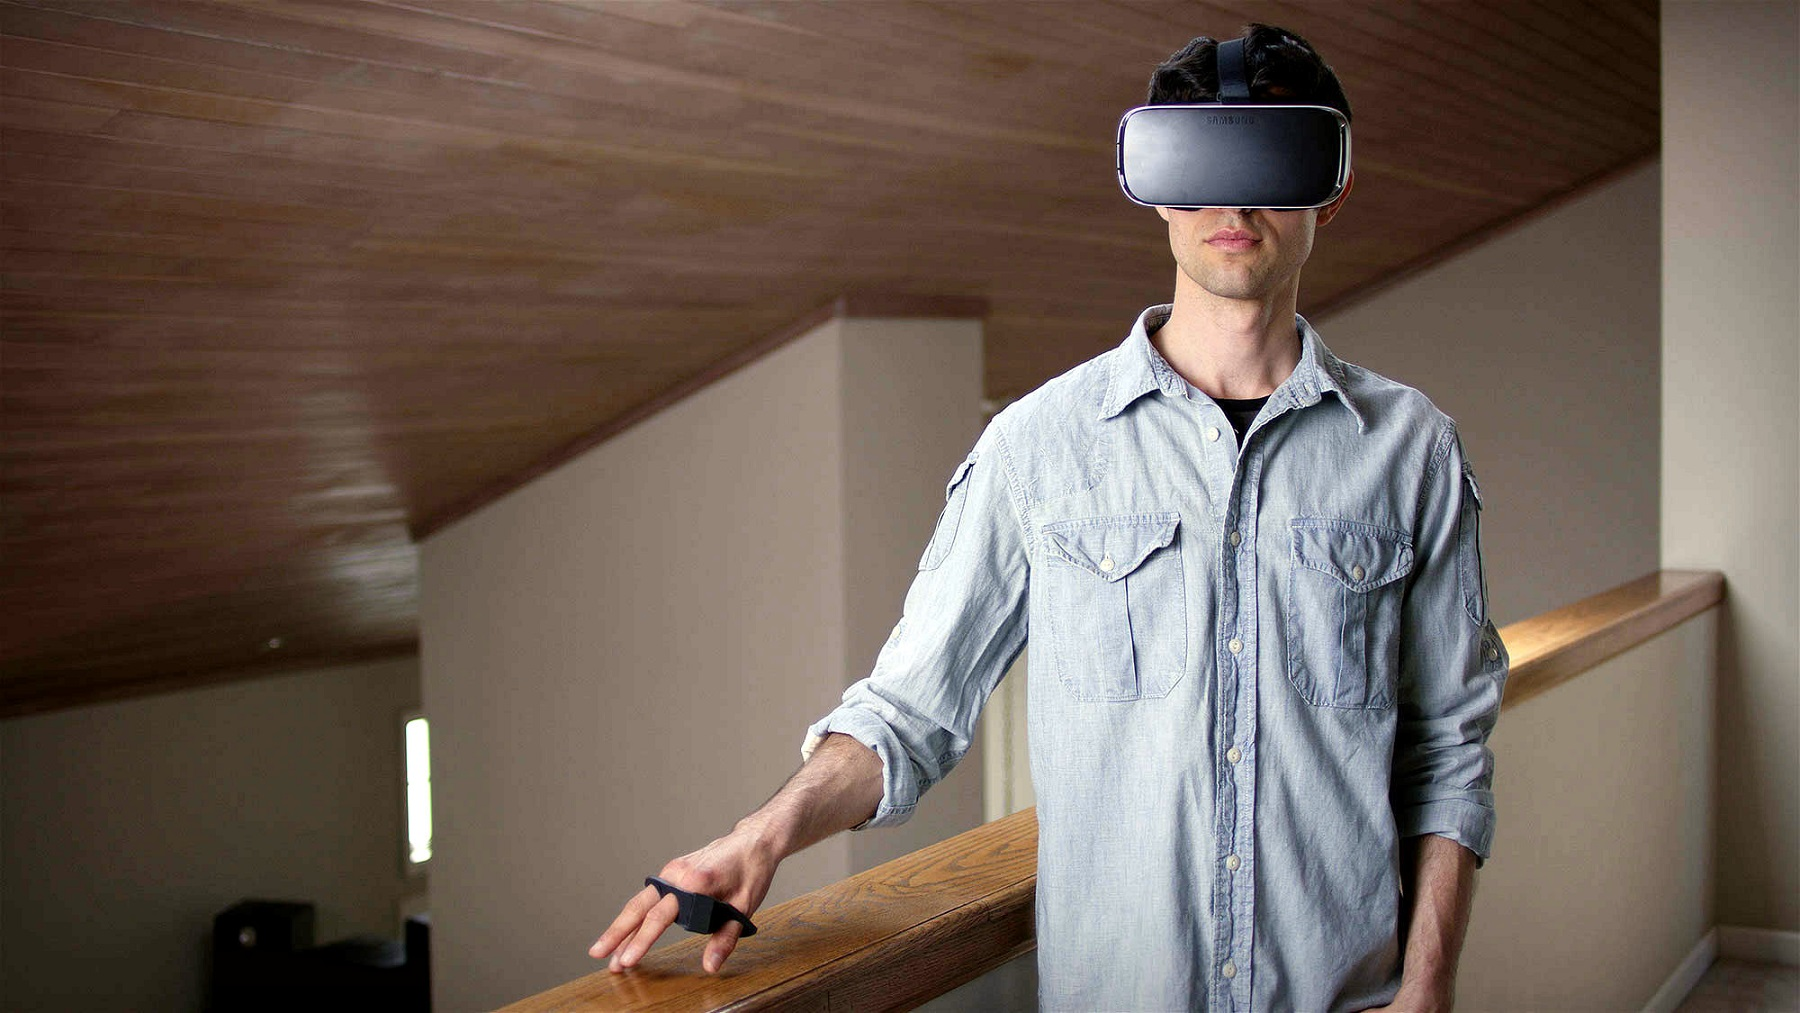 Tap VR